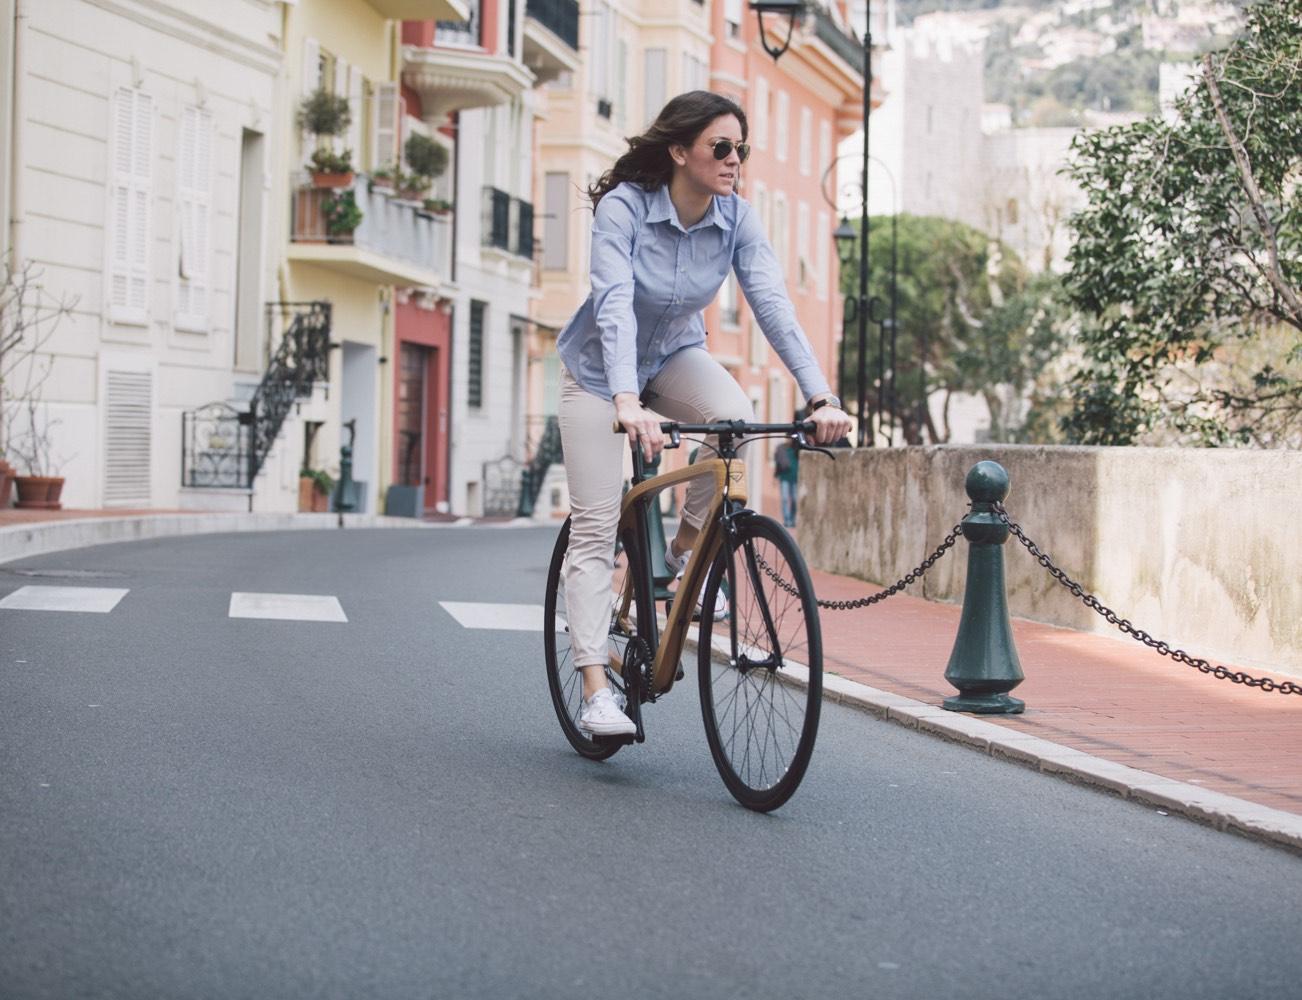 Svarog City Bike by Tratar Bikes